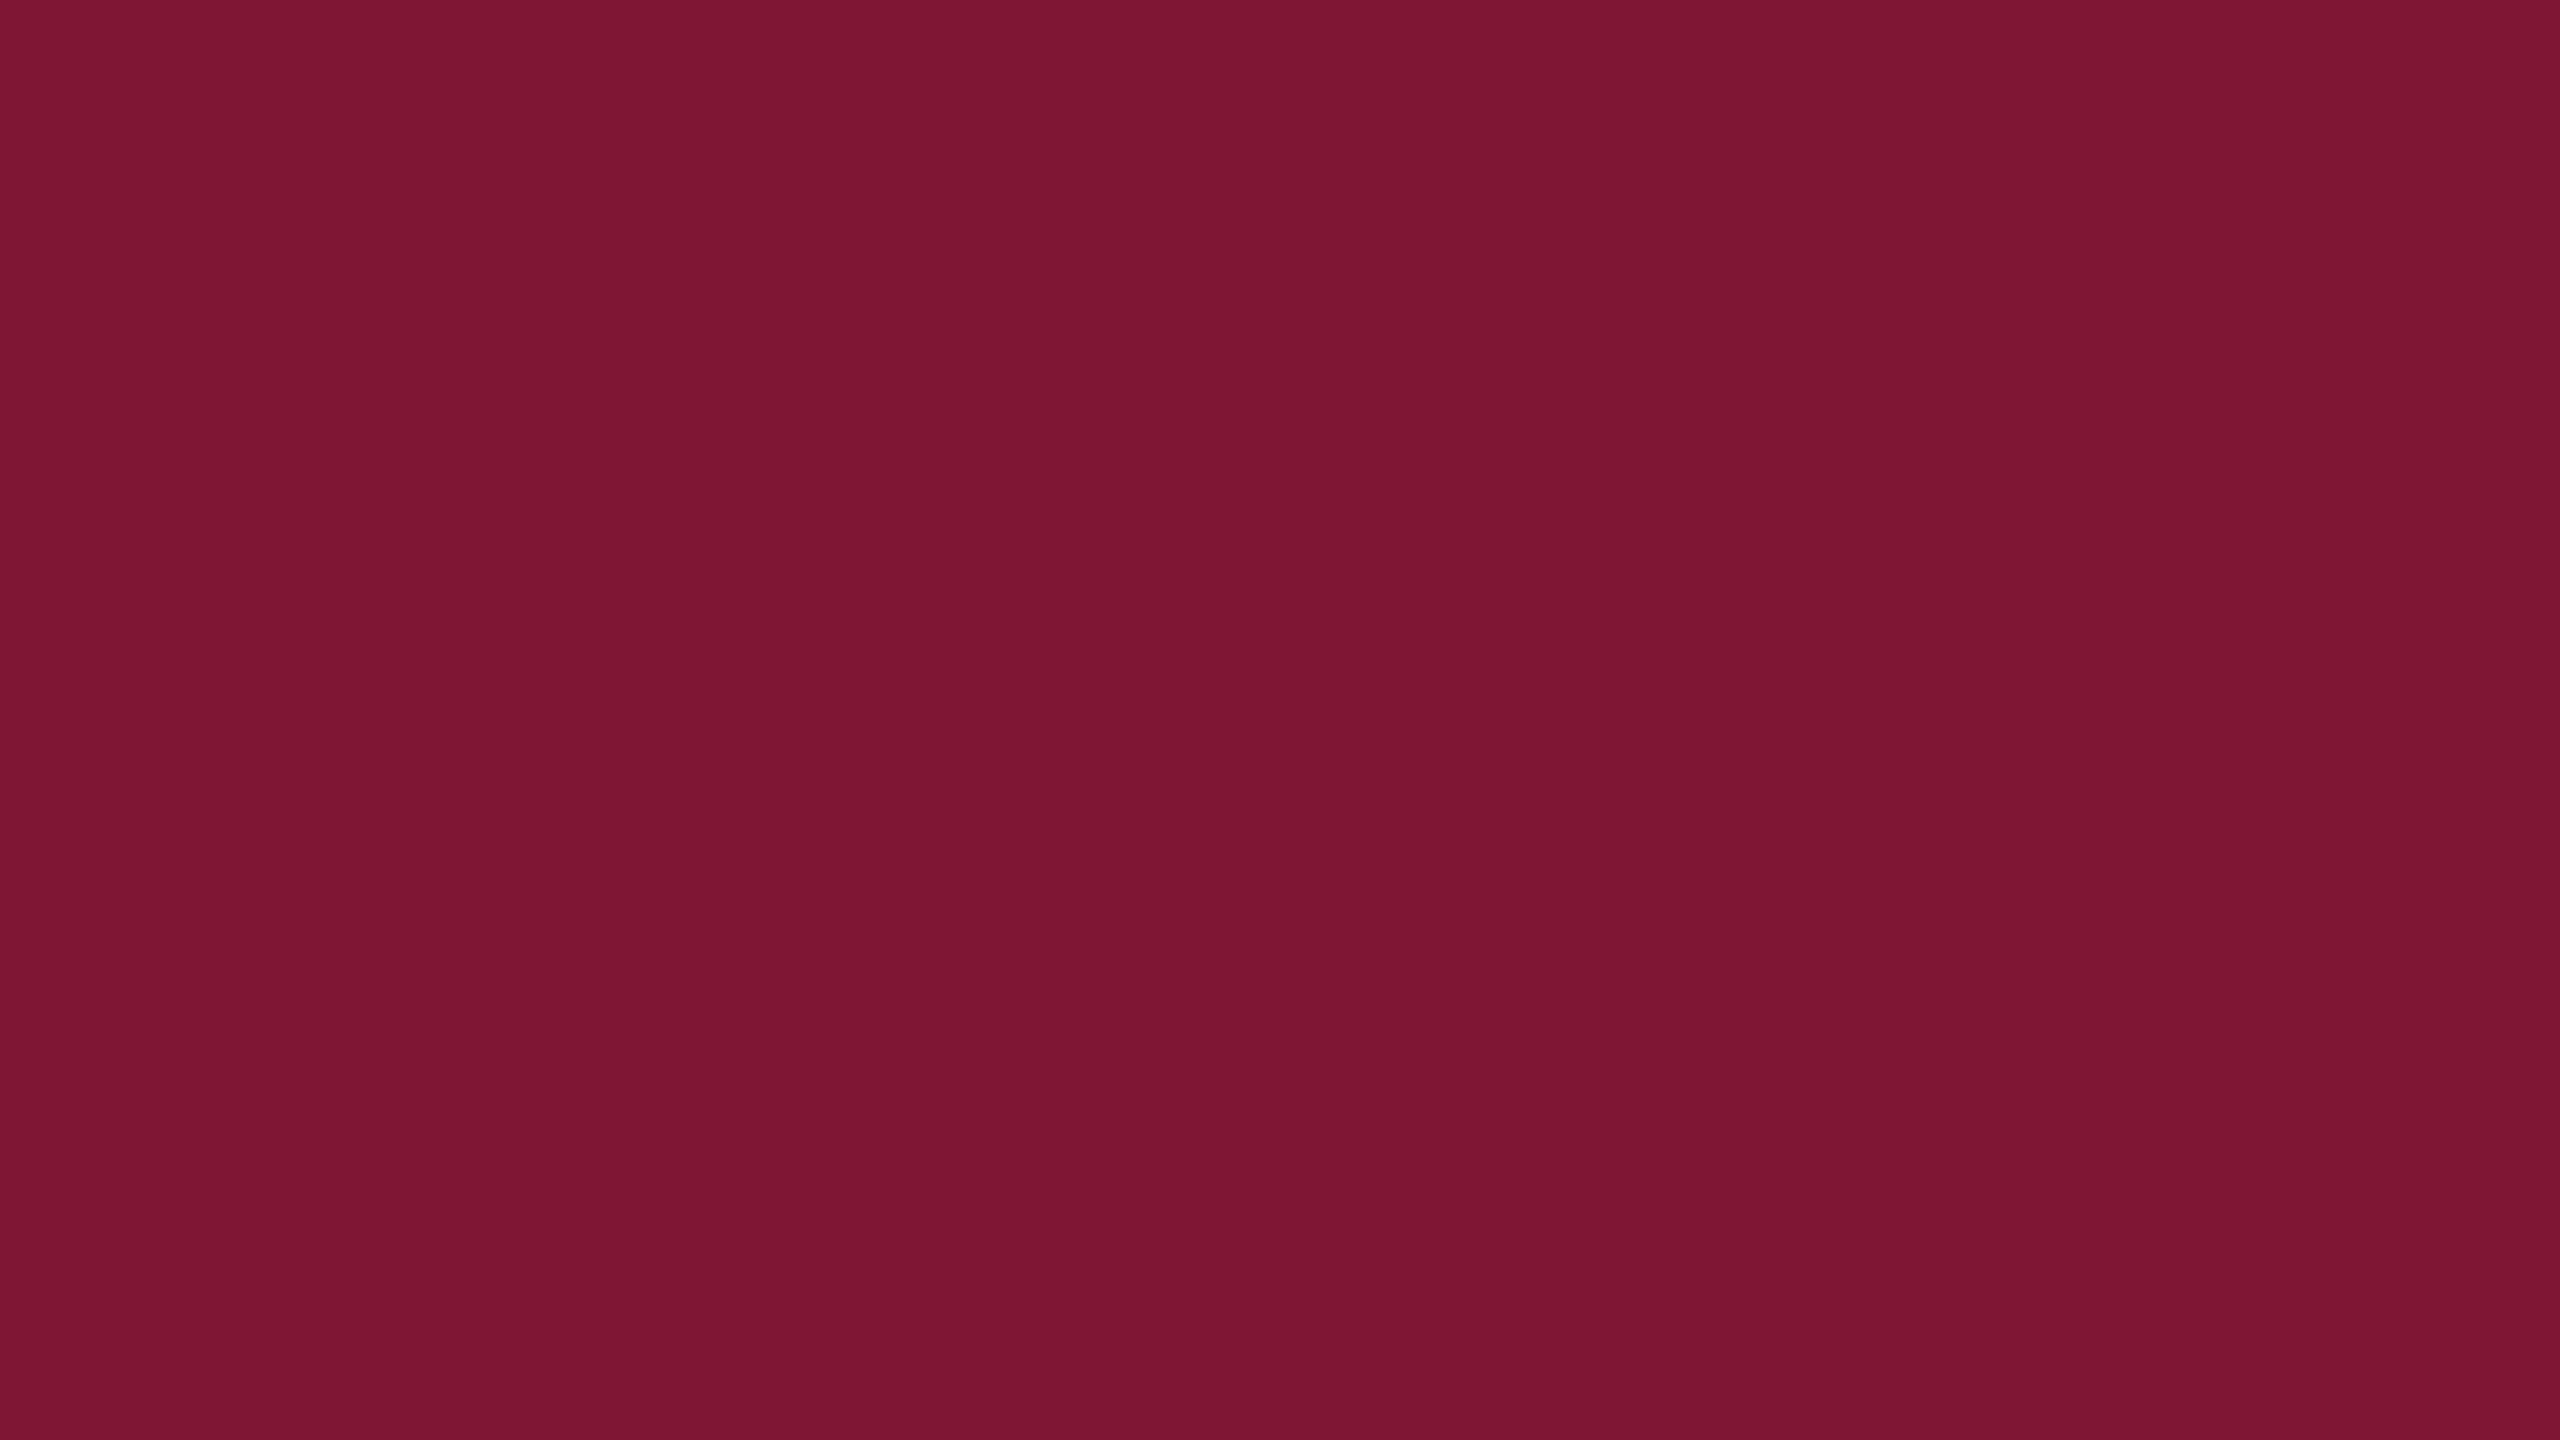 2560x1440 Claret Solid Color Background